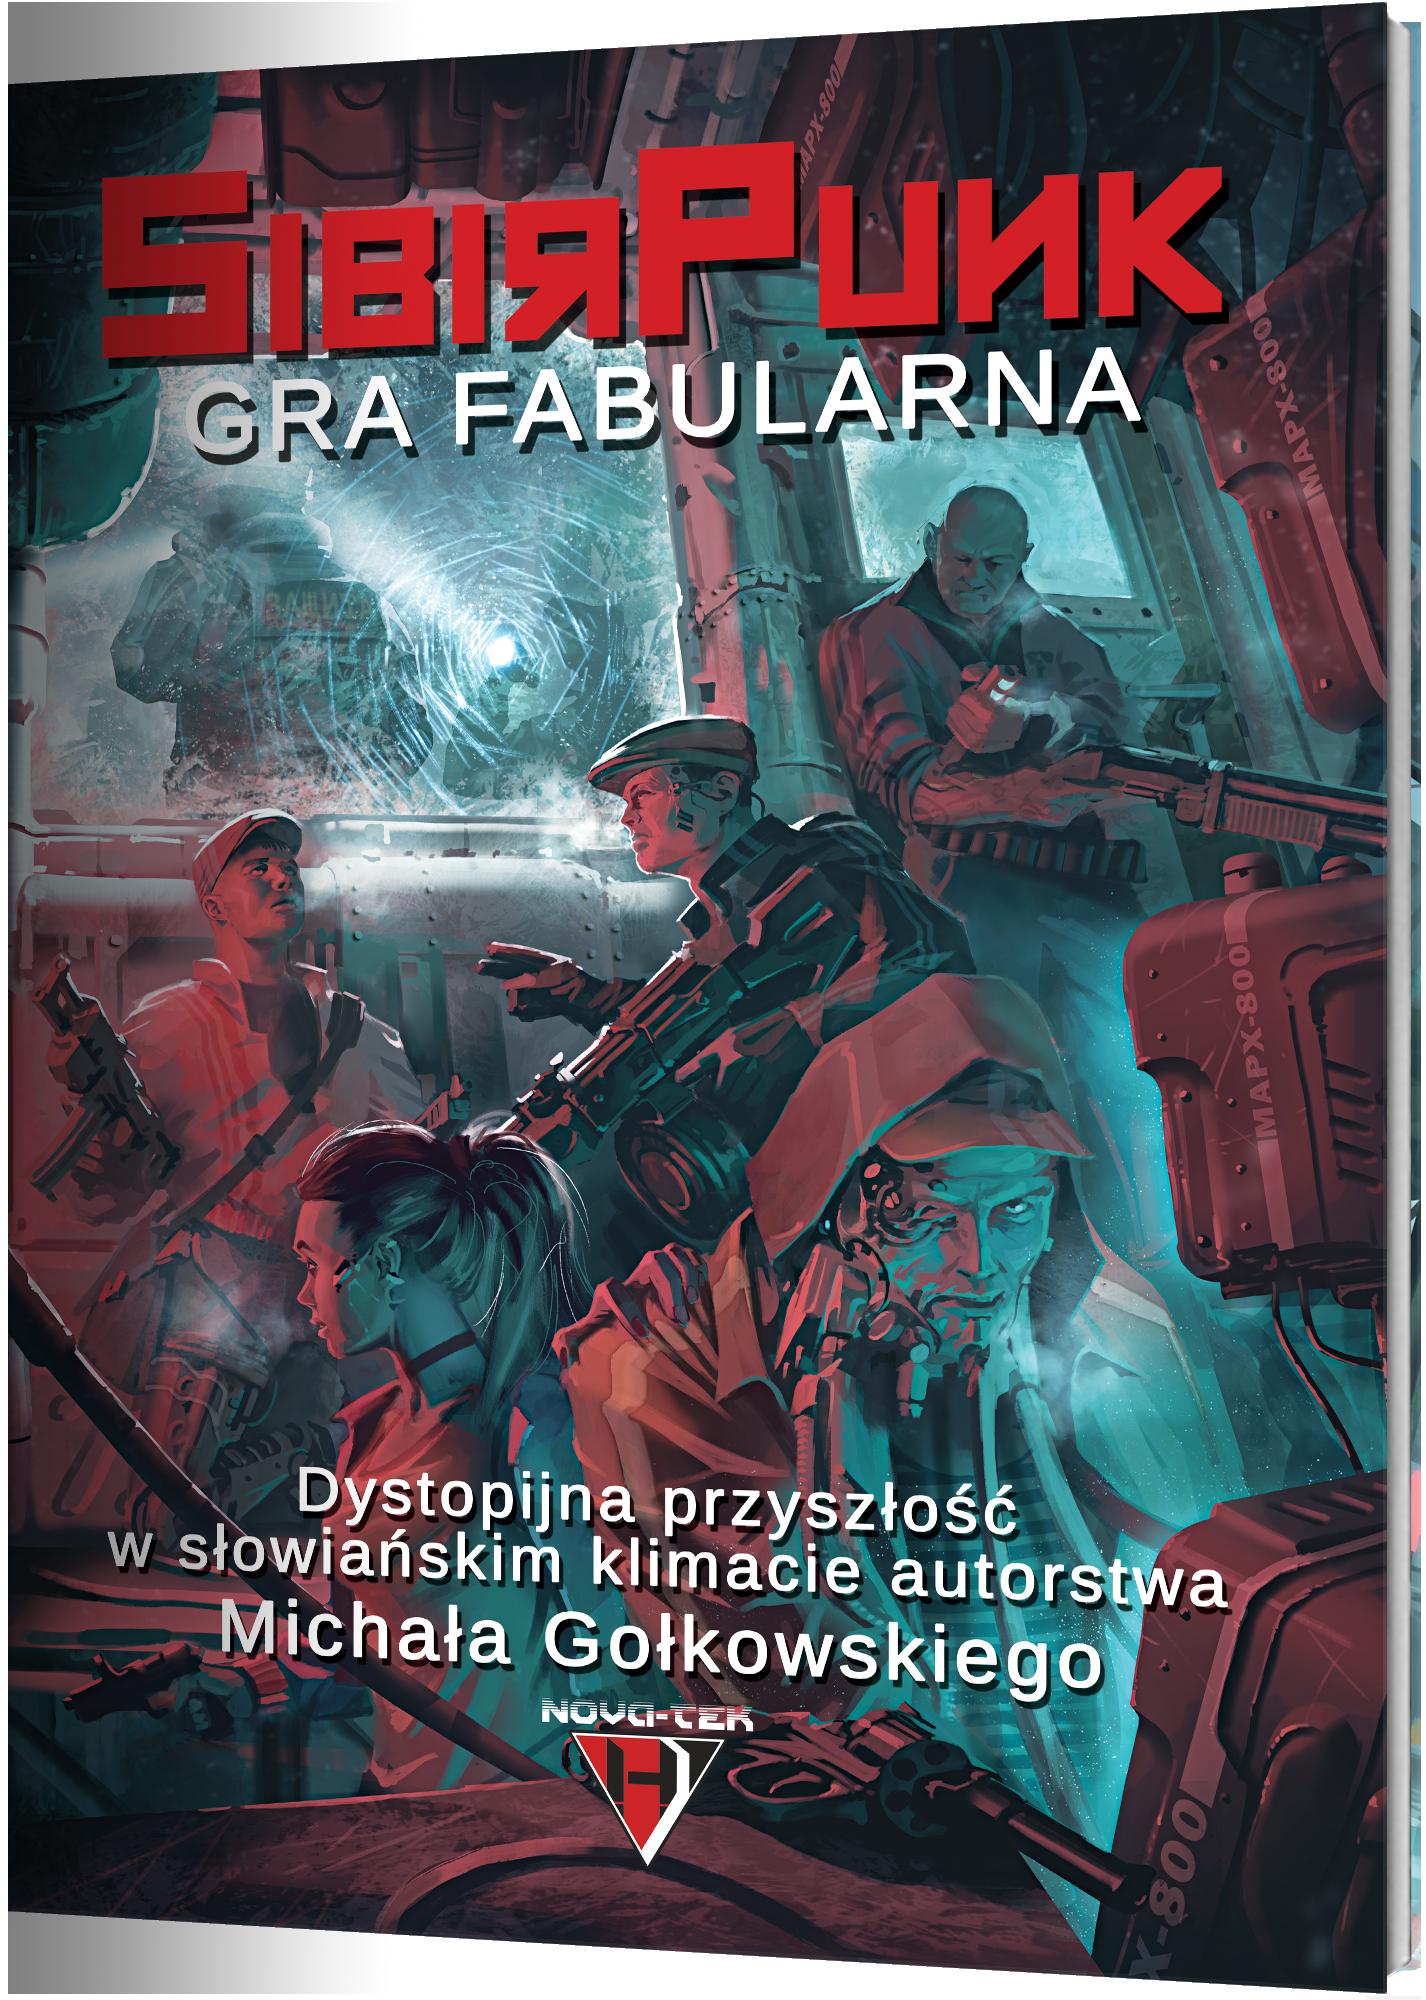 SibirPunk RPG